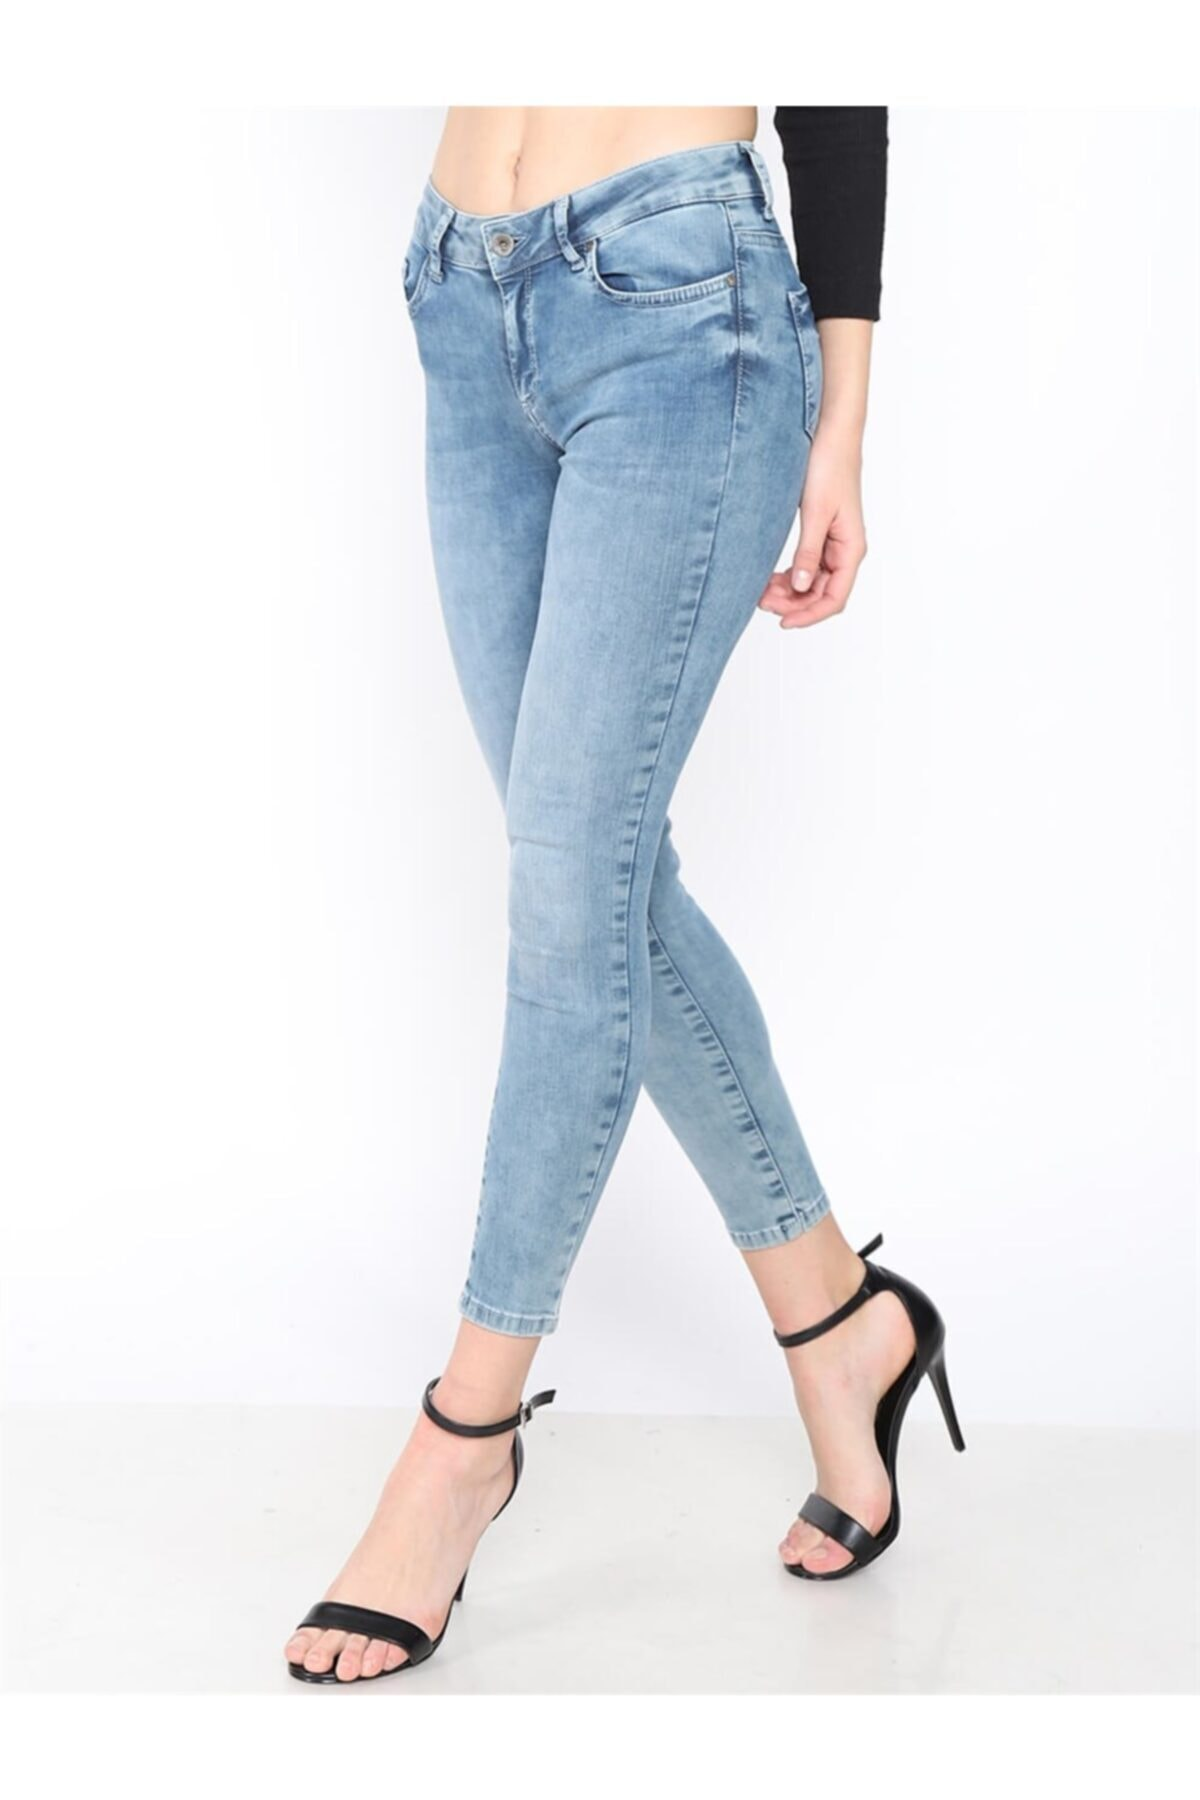 Twister Jeans Kadın Pantolon Lima 9046-18 18 2